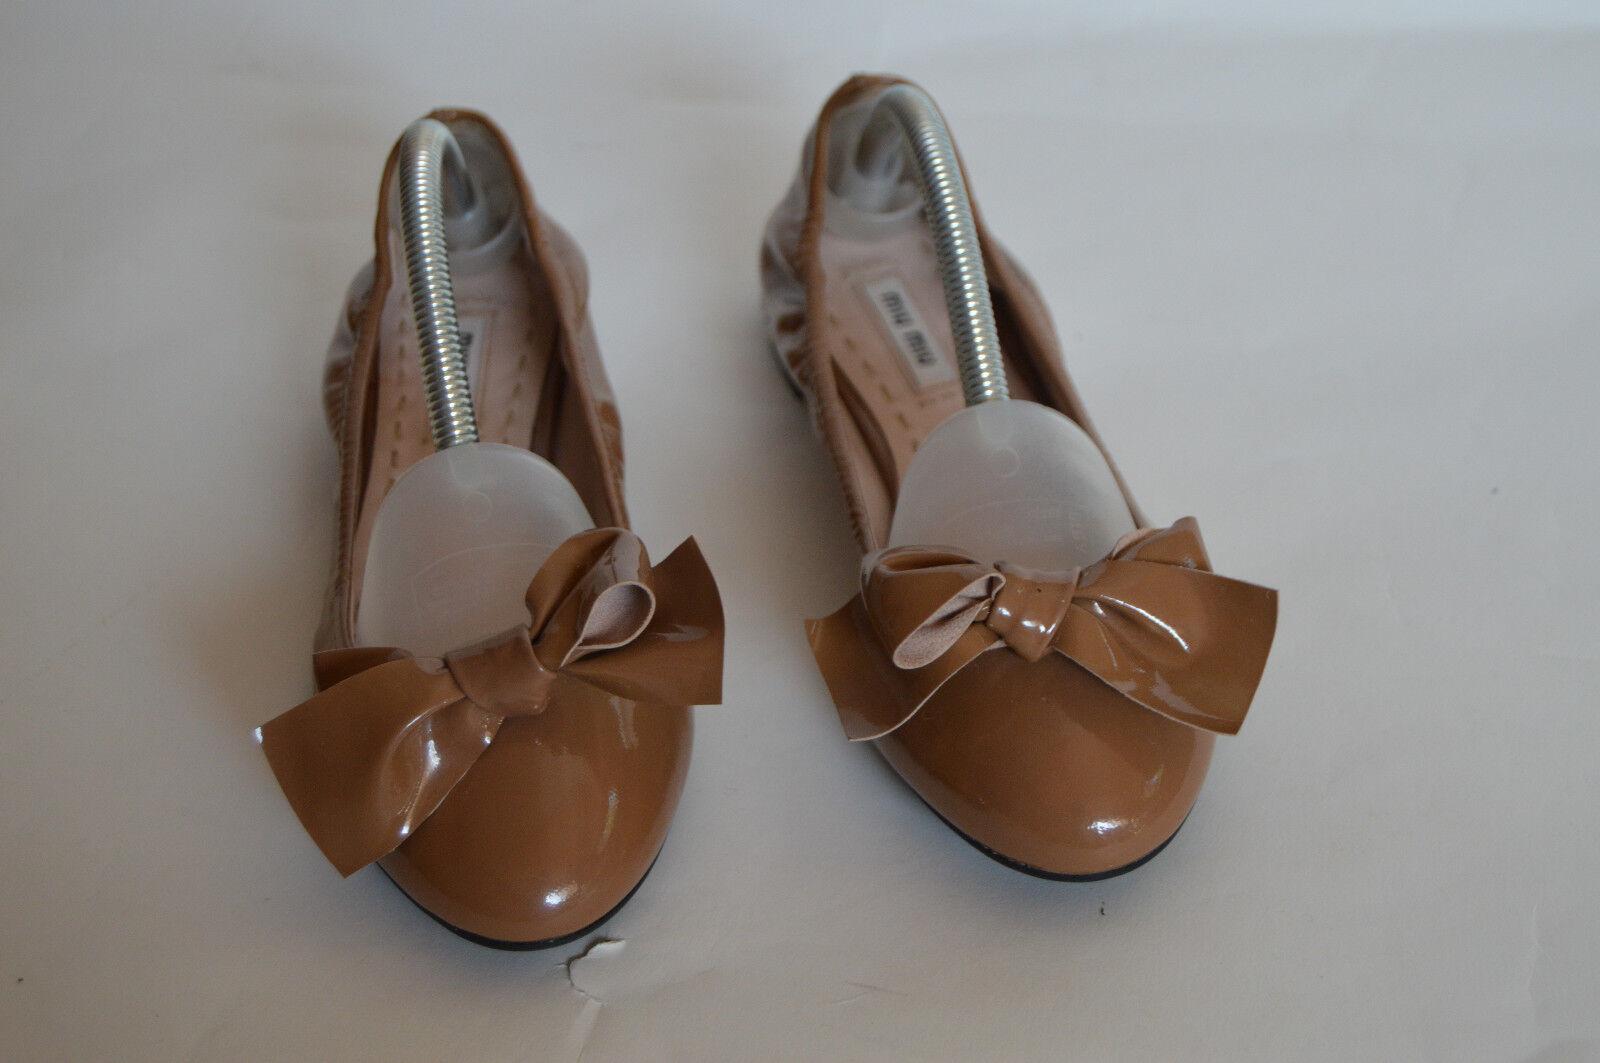 MIU MIU marrone patent leather jeweled heel ballet flats size 8.5 US   38.5 EU